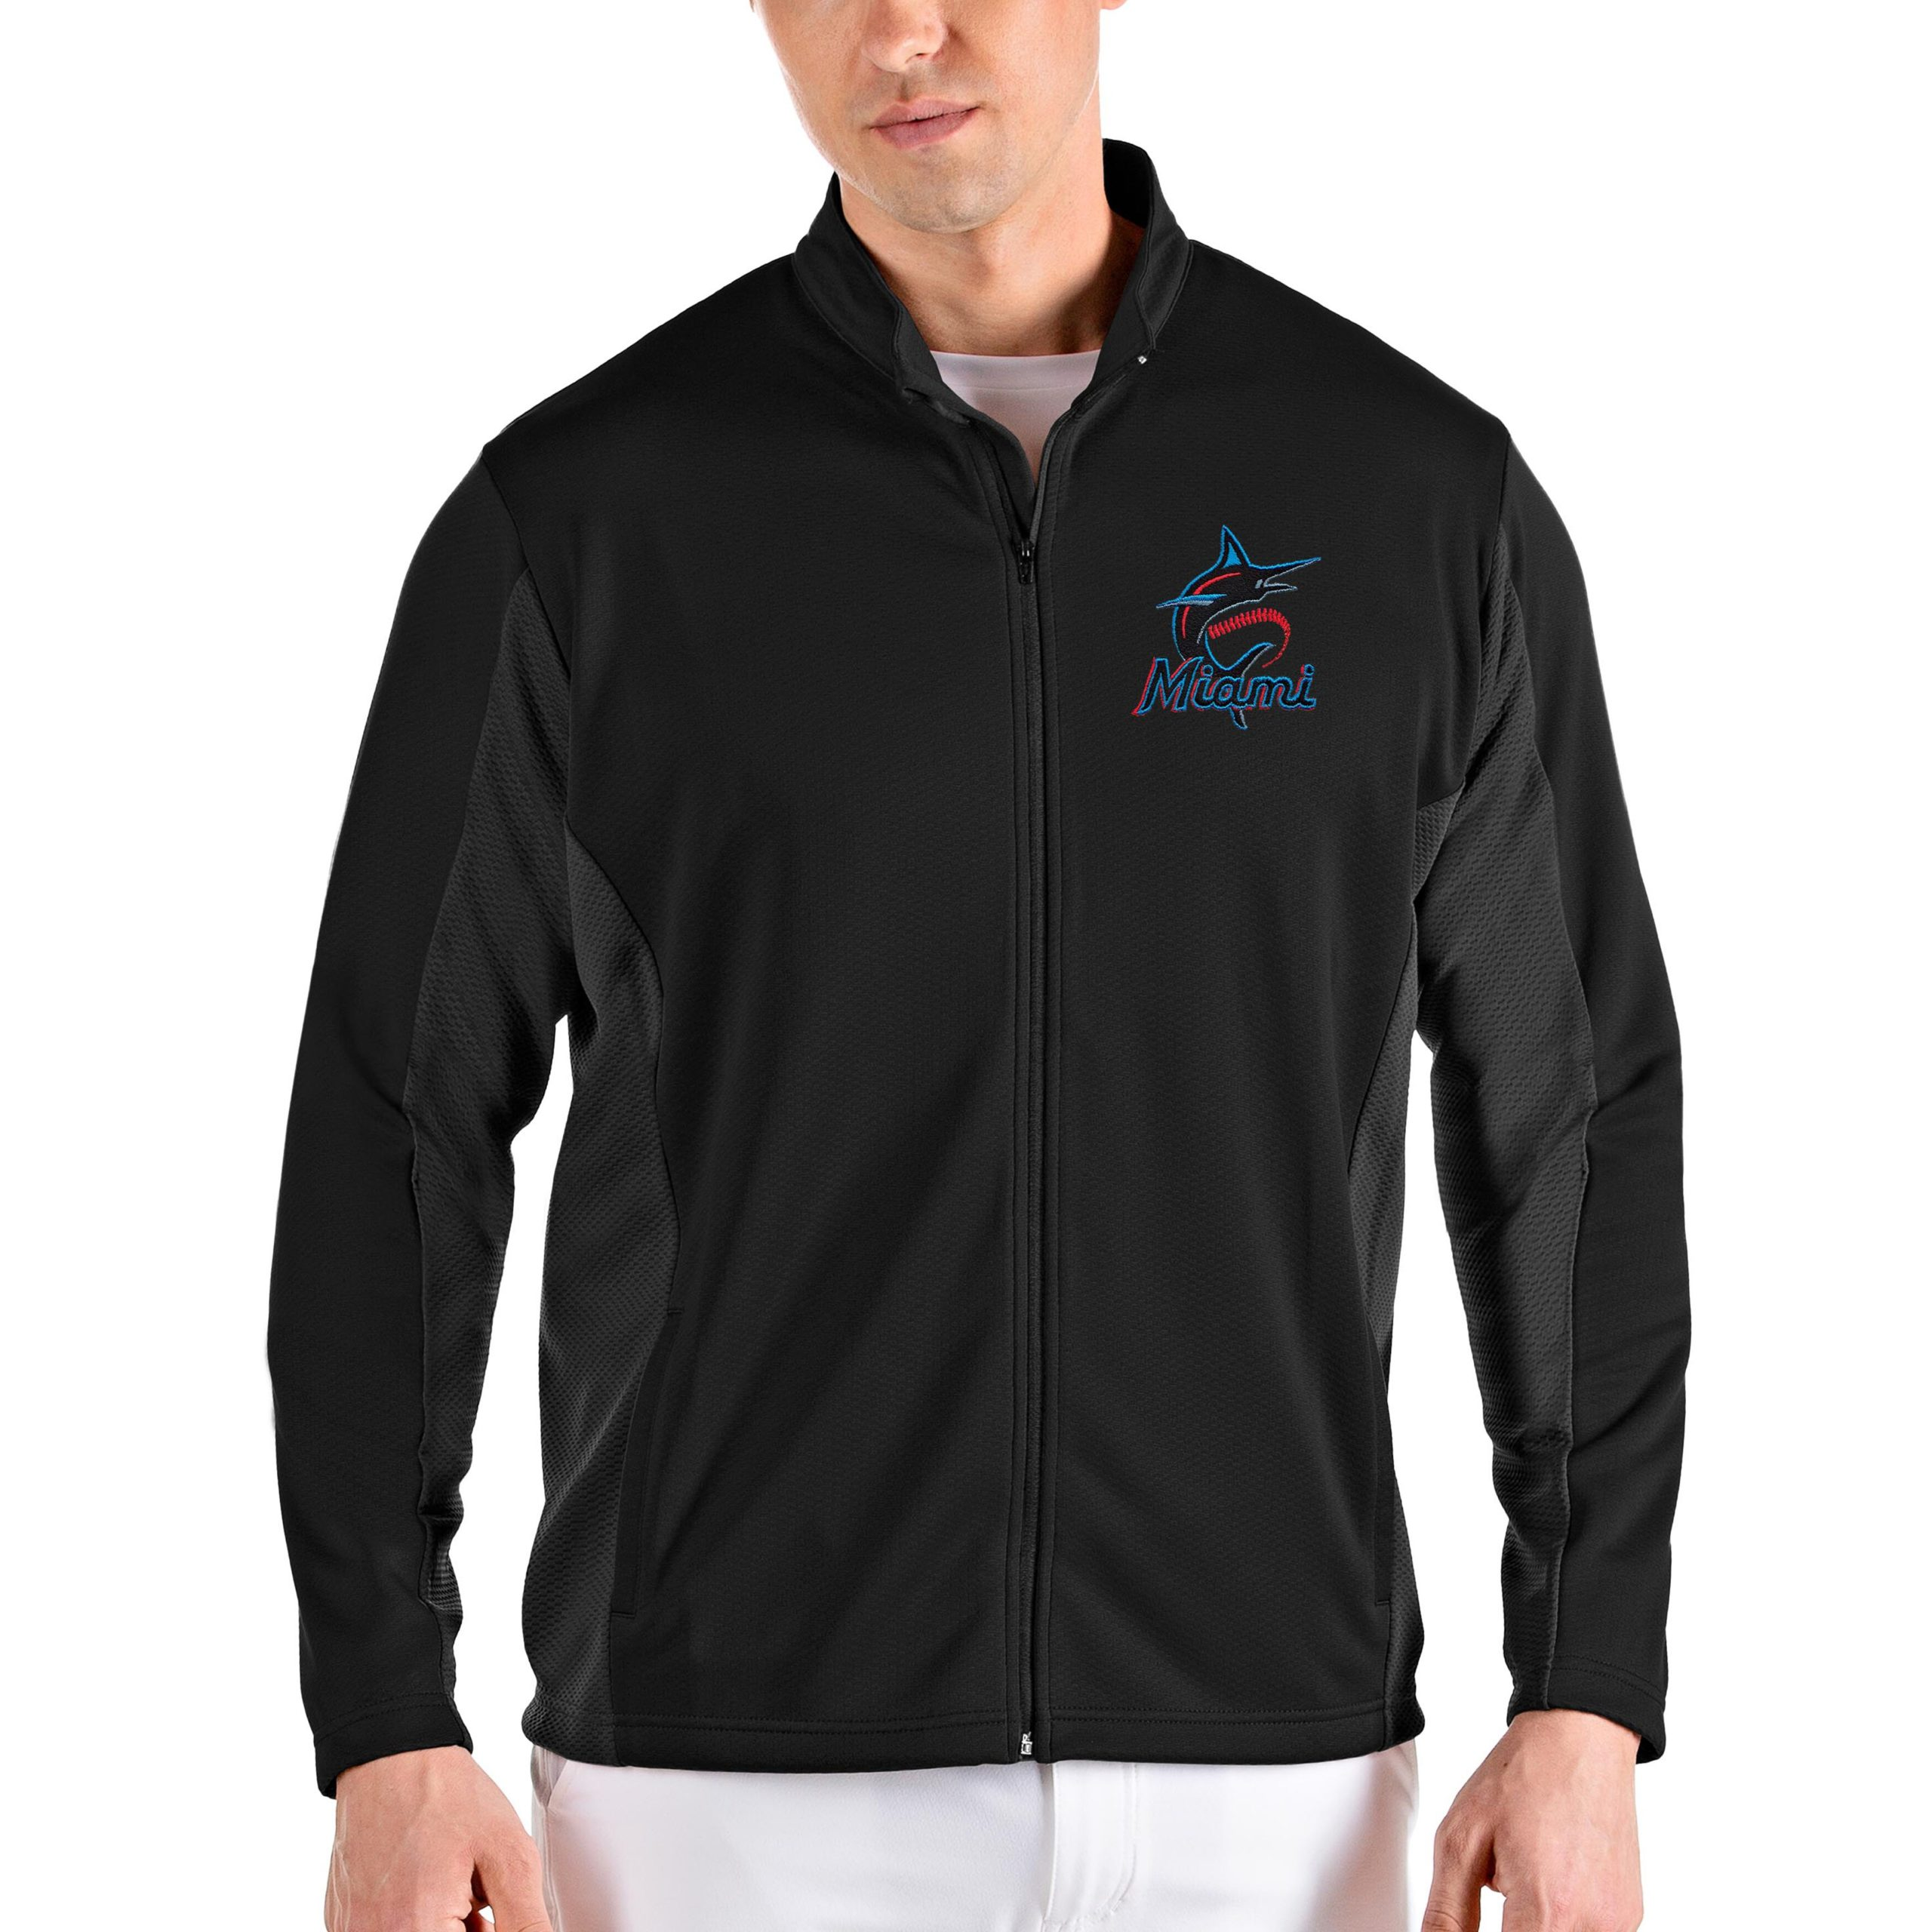 Miami Marlins Antigua Passage Full-Zip Jacket - Black